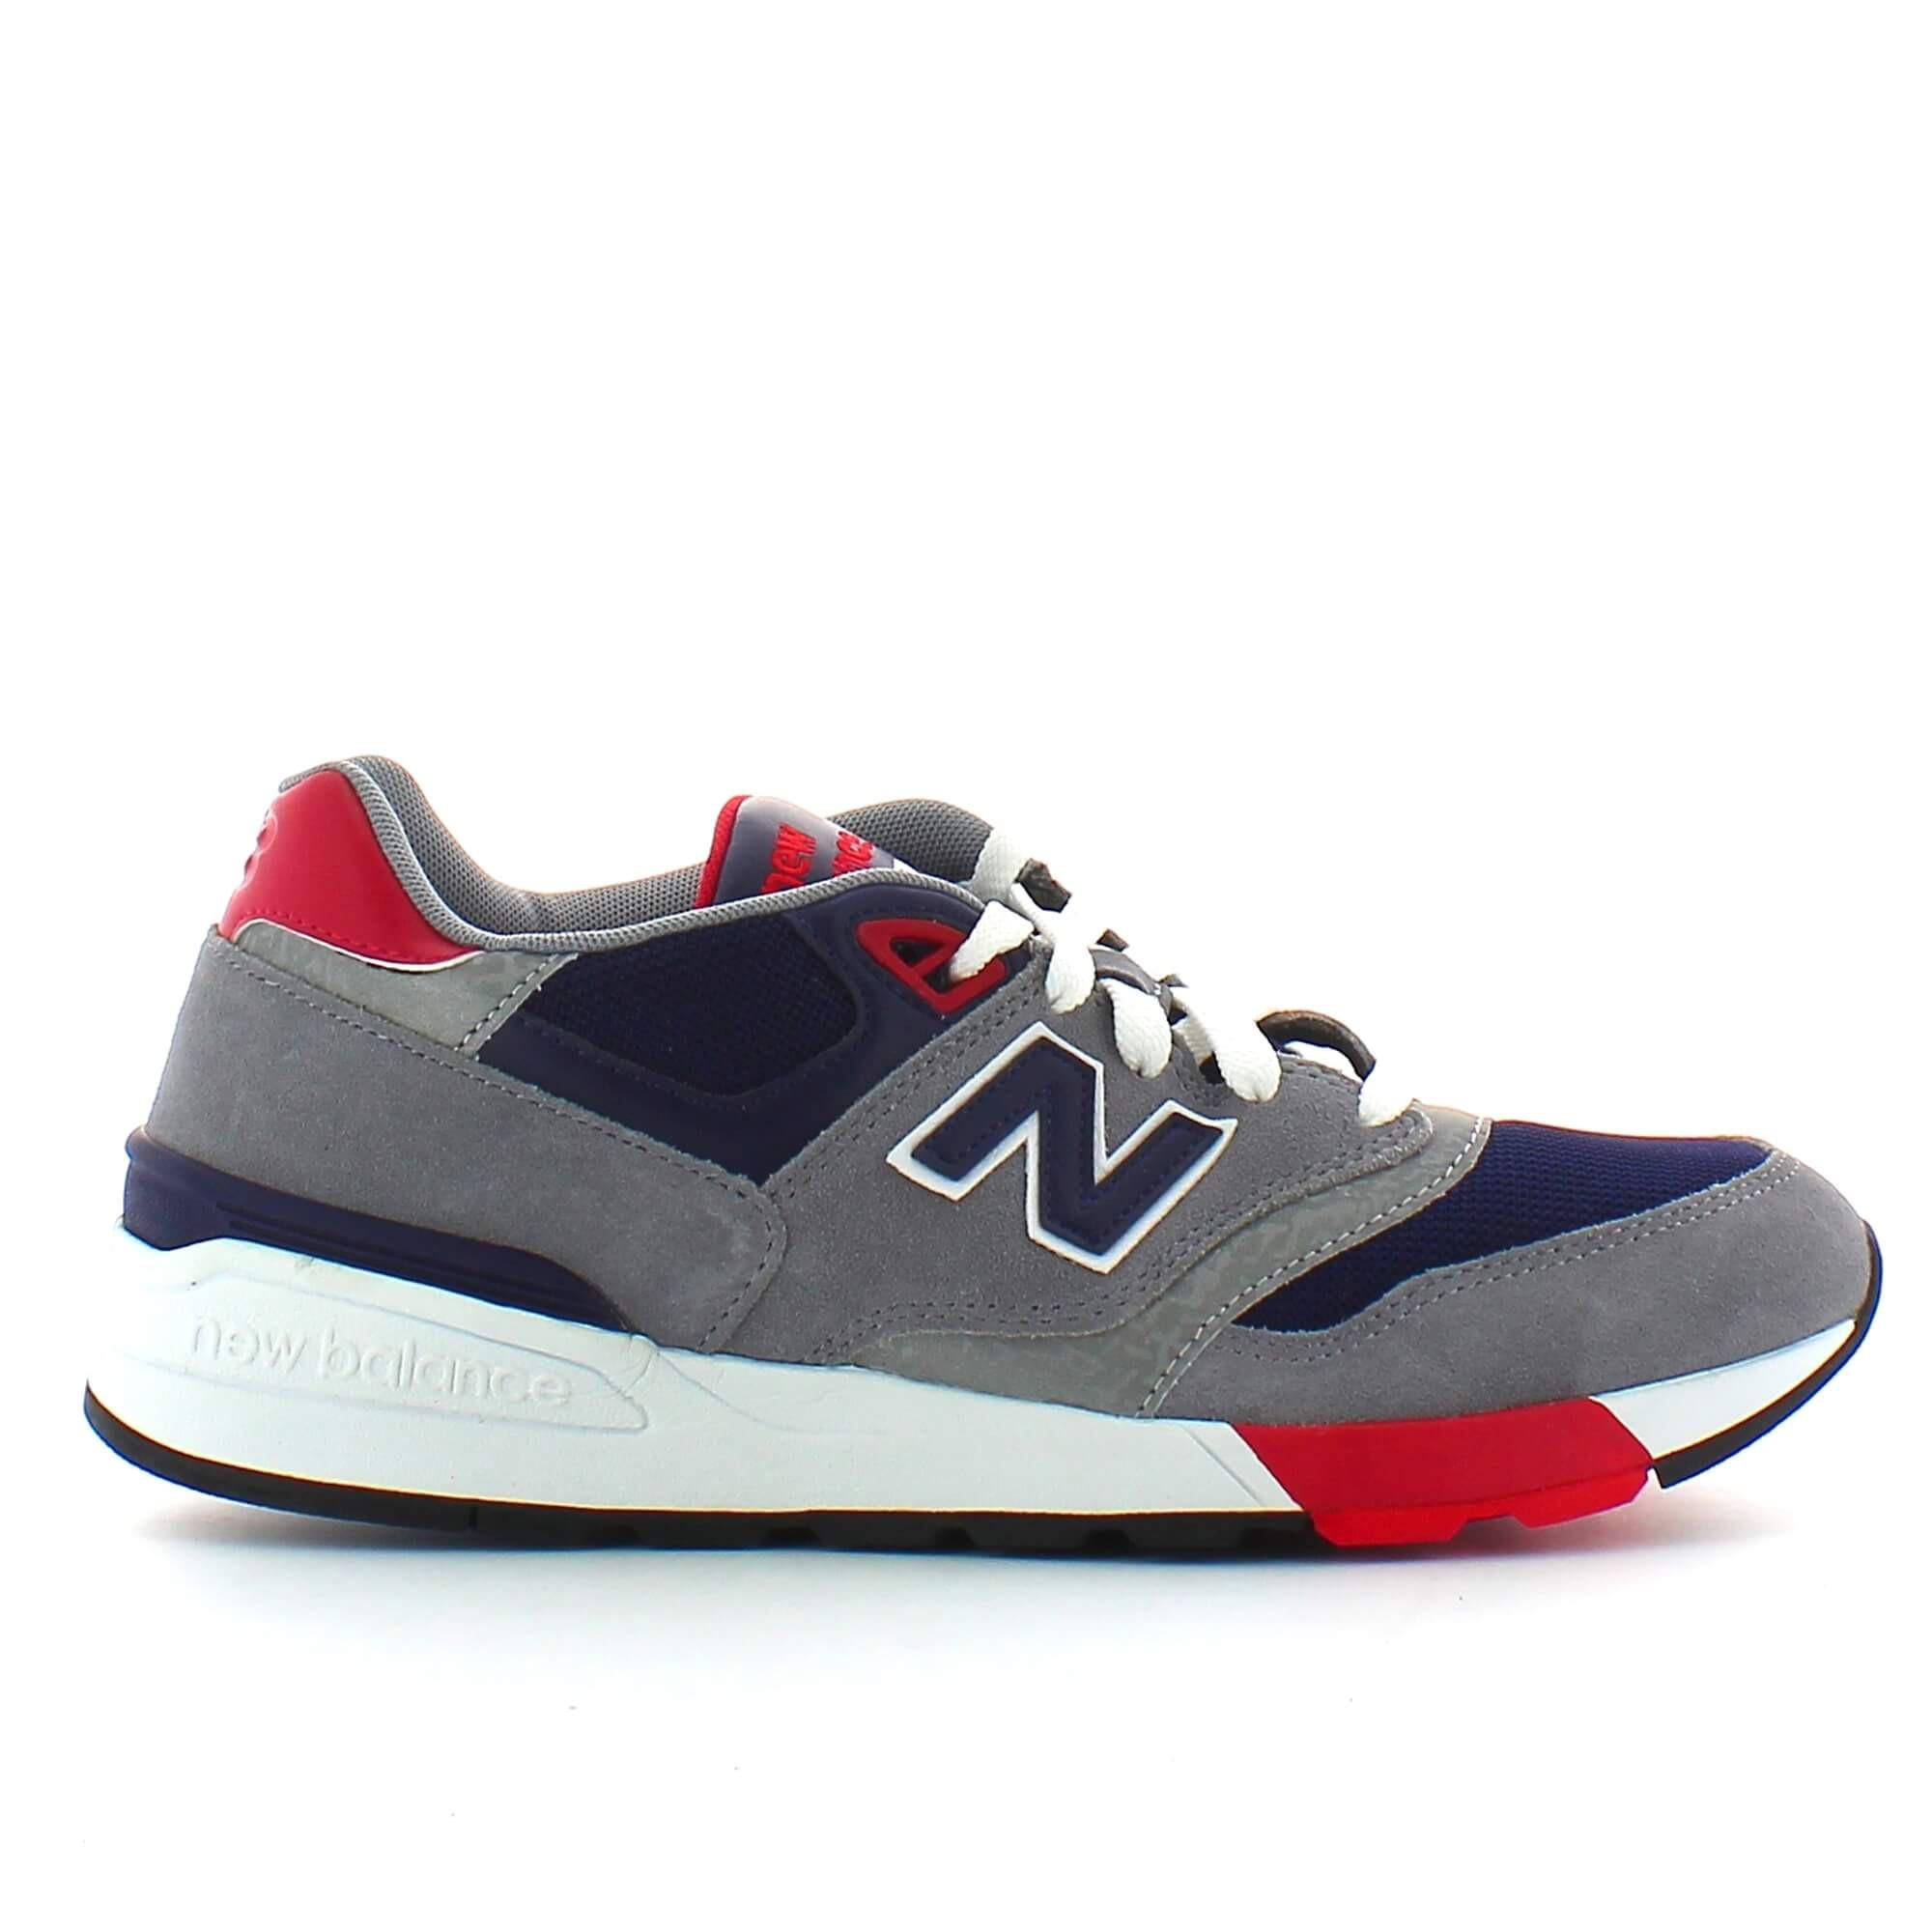 zapatillas new balance 597